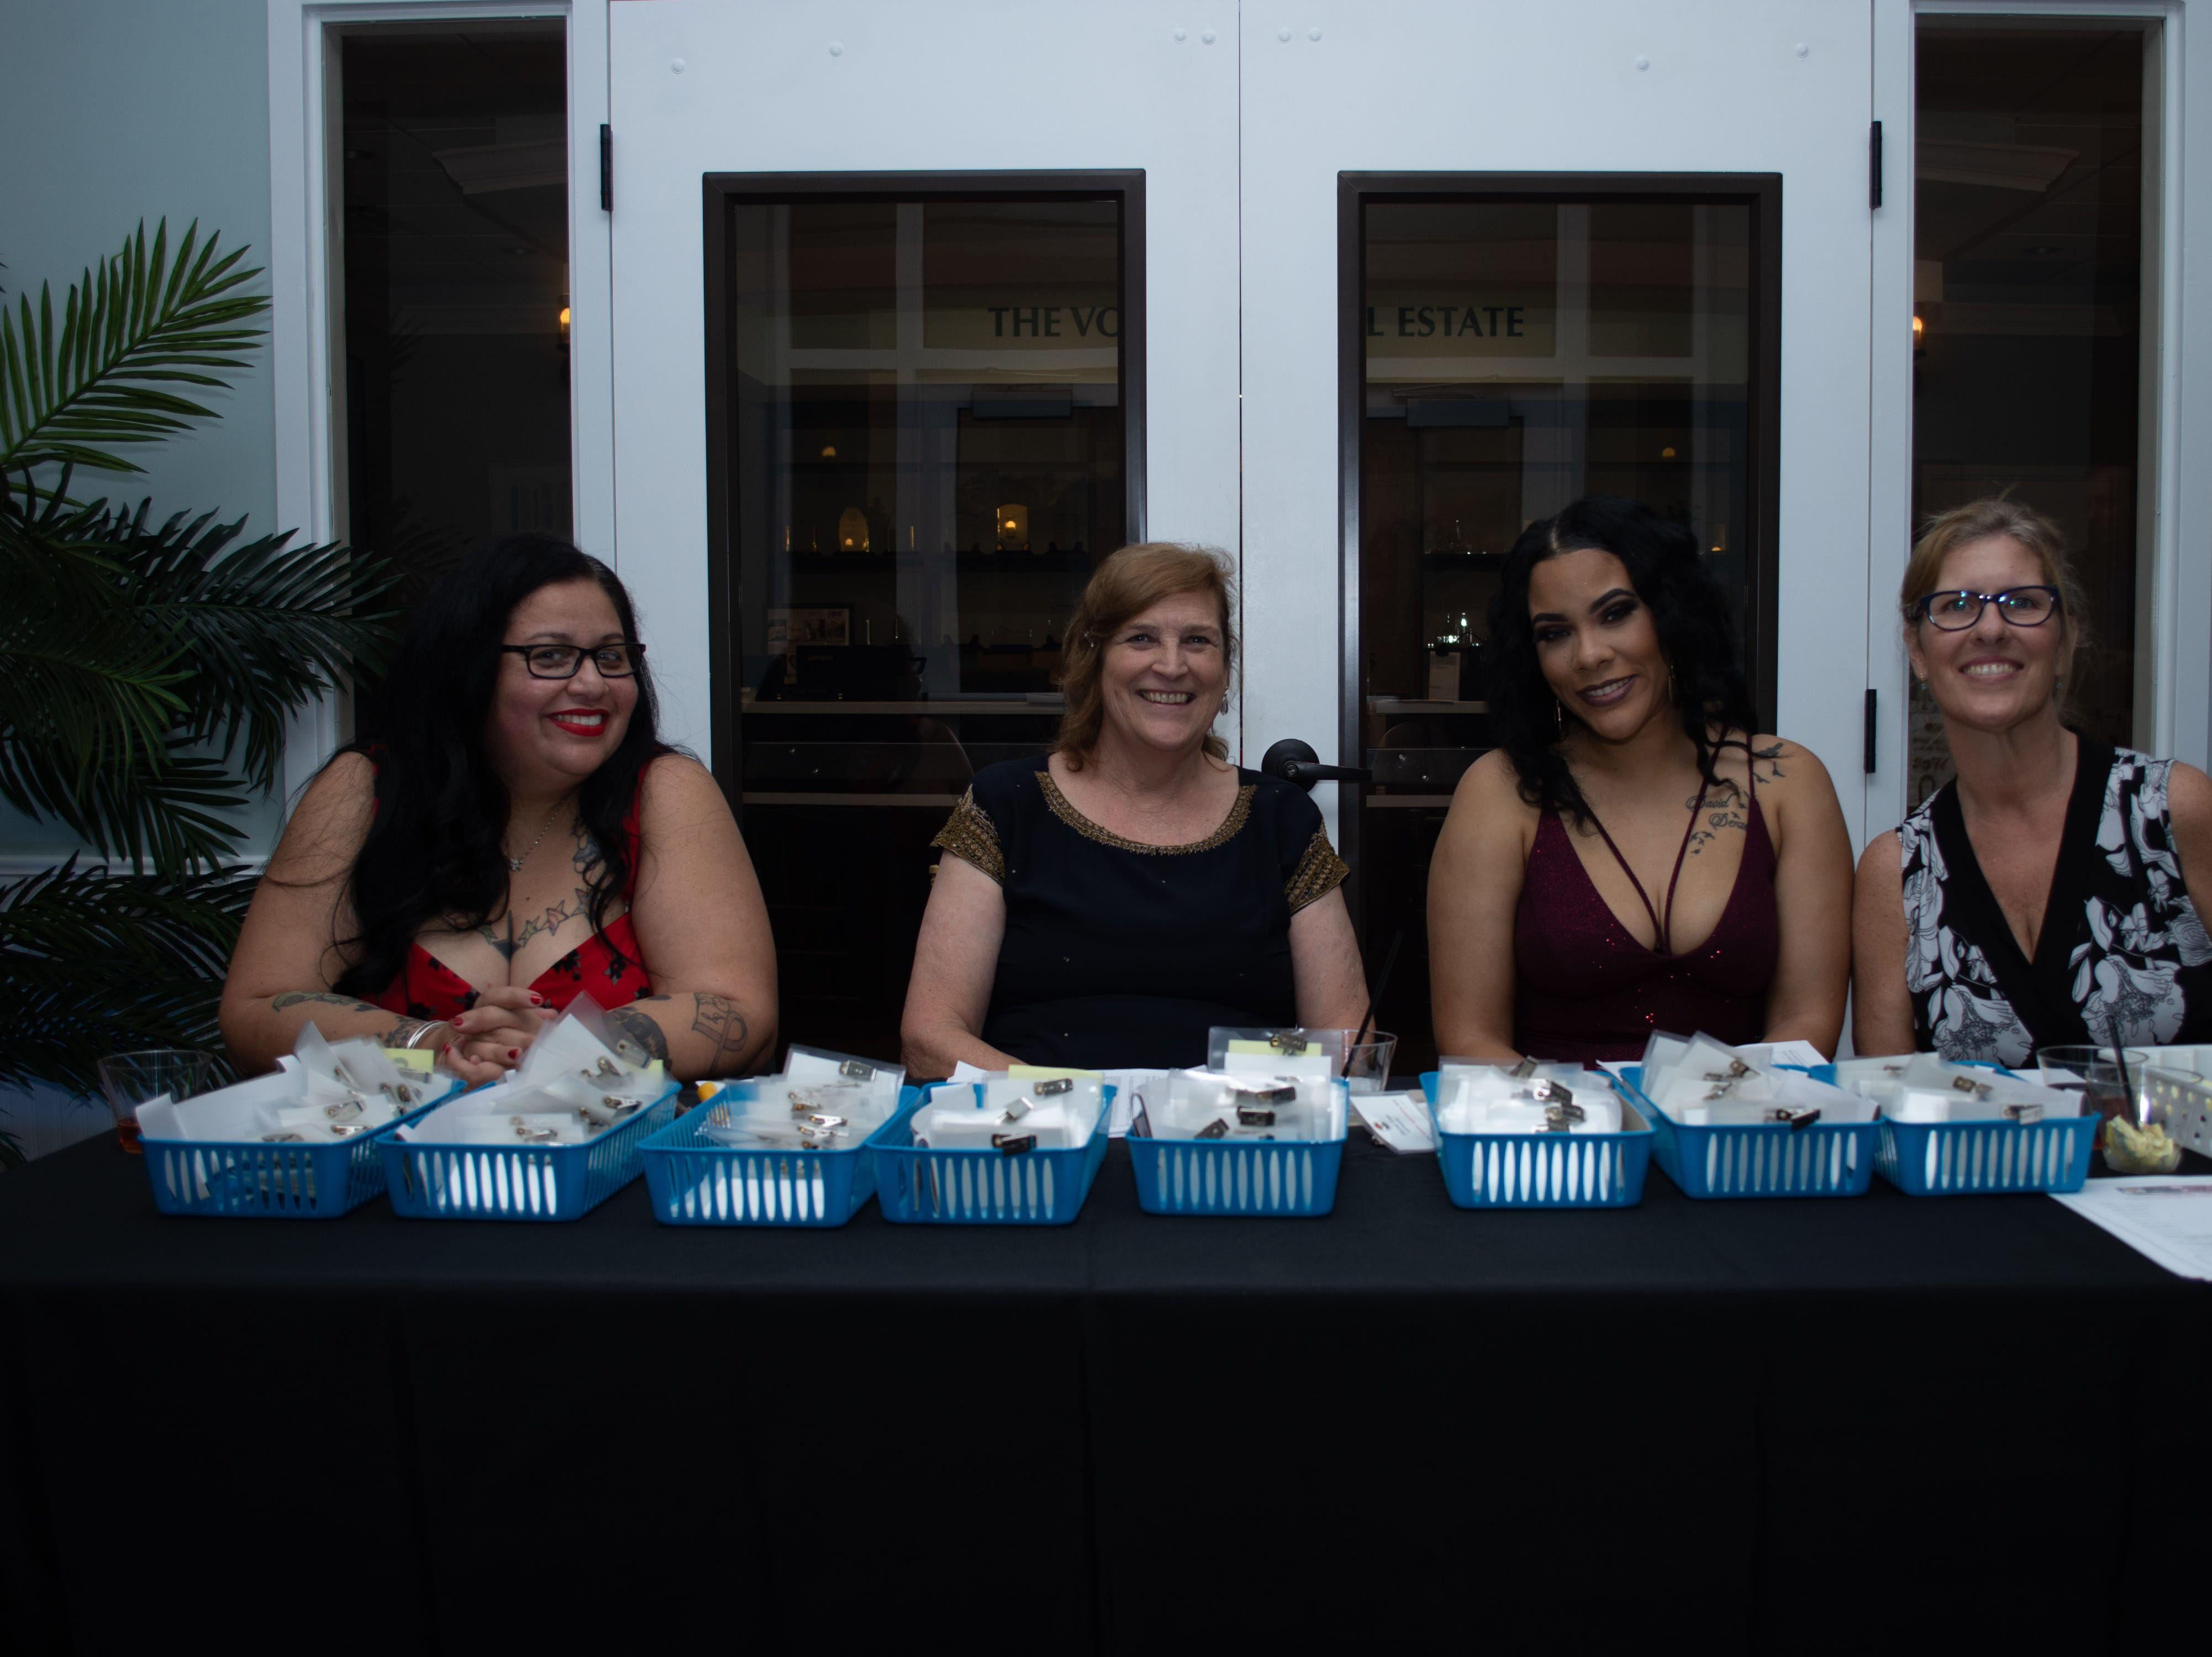 Check in table volunteers Yvonne Rountree, Roberta Arjona, Jasmin Delarosa, and Cindy Shirley.